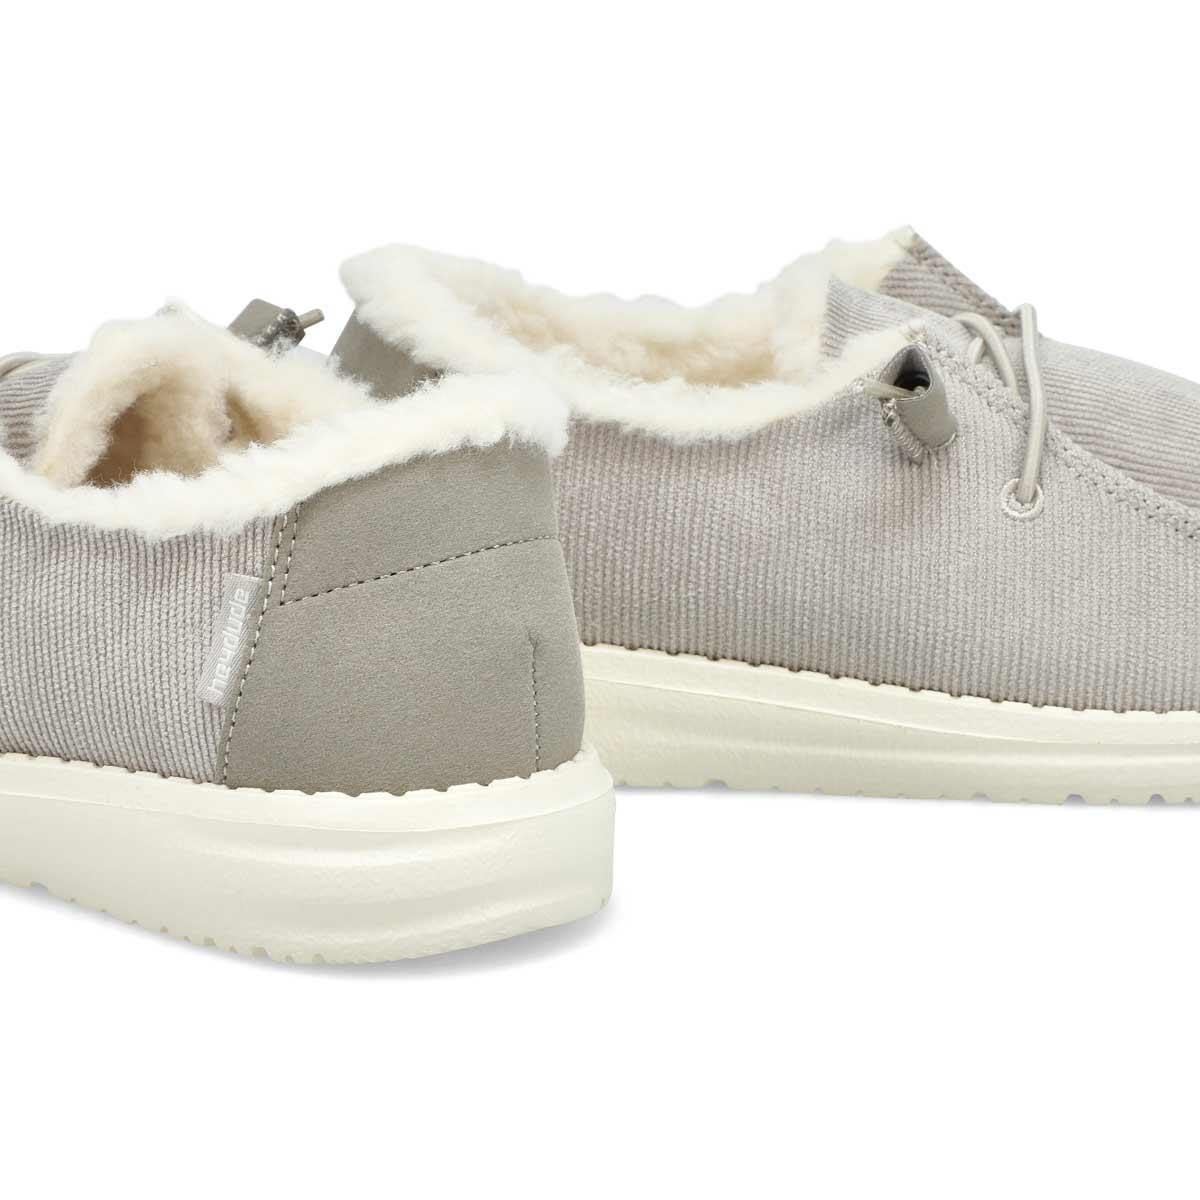 Chaussure tout-aller Wendy Corduroy, femmes - Gris